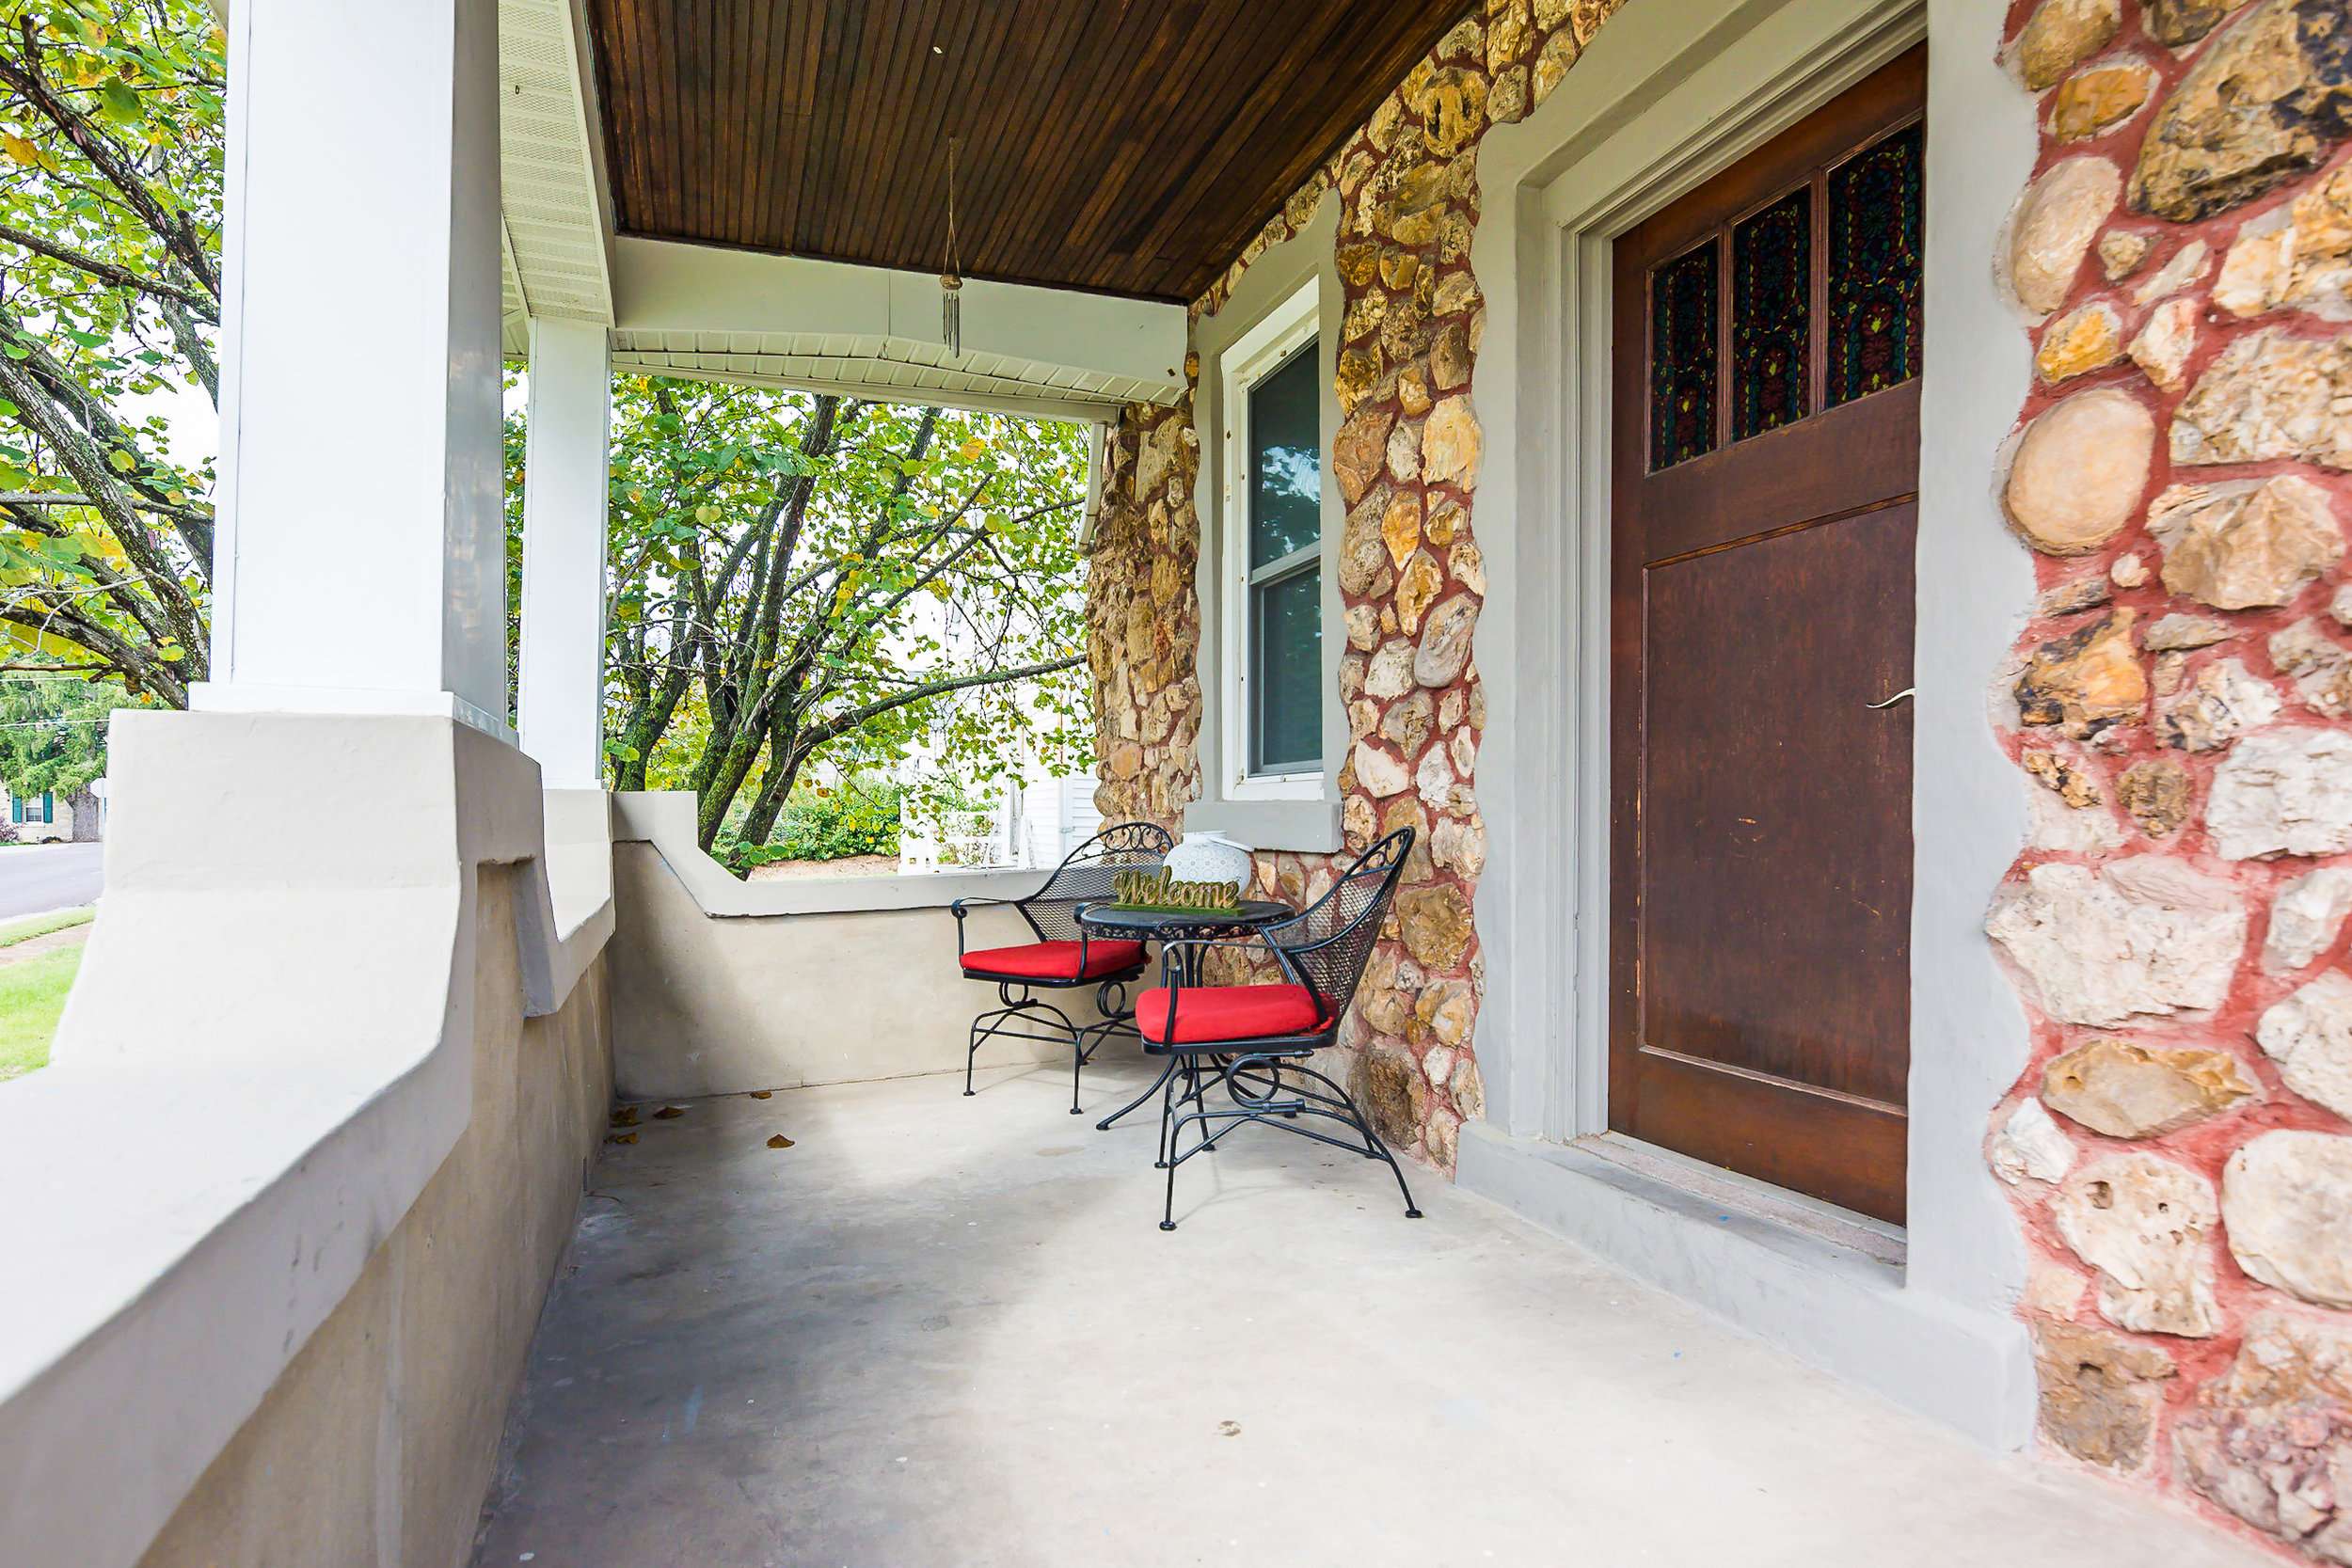 Stone-Cottage-Hermann-Missouri-vacation-rental-02-1003.jpg